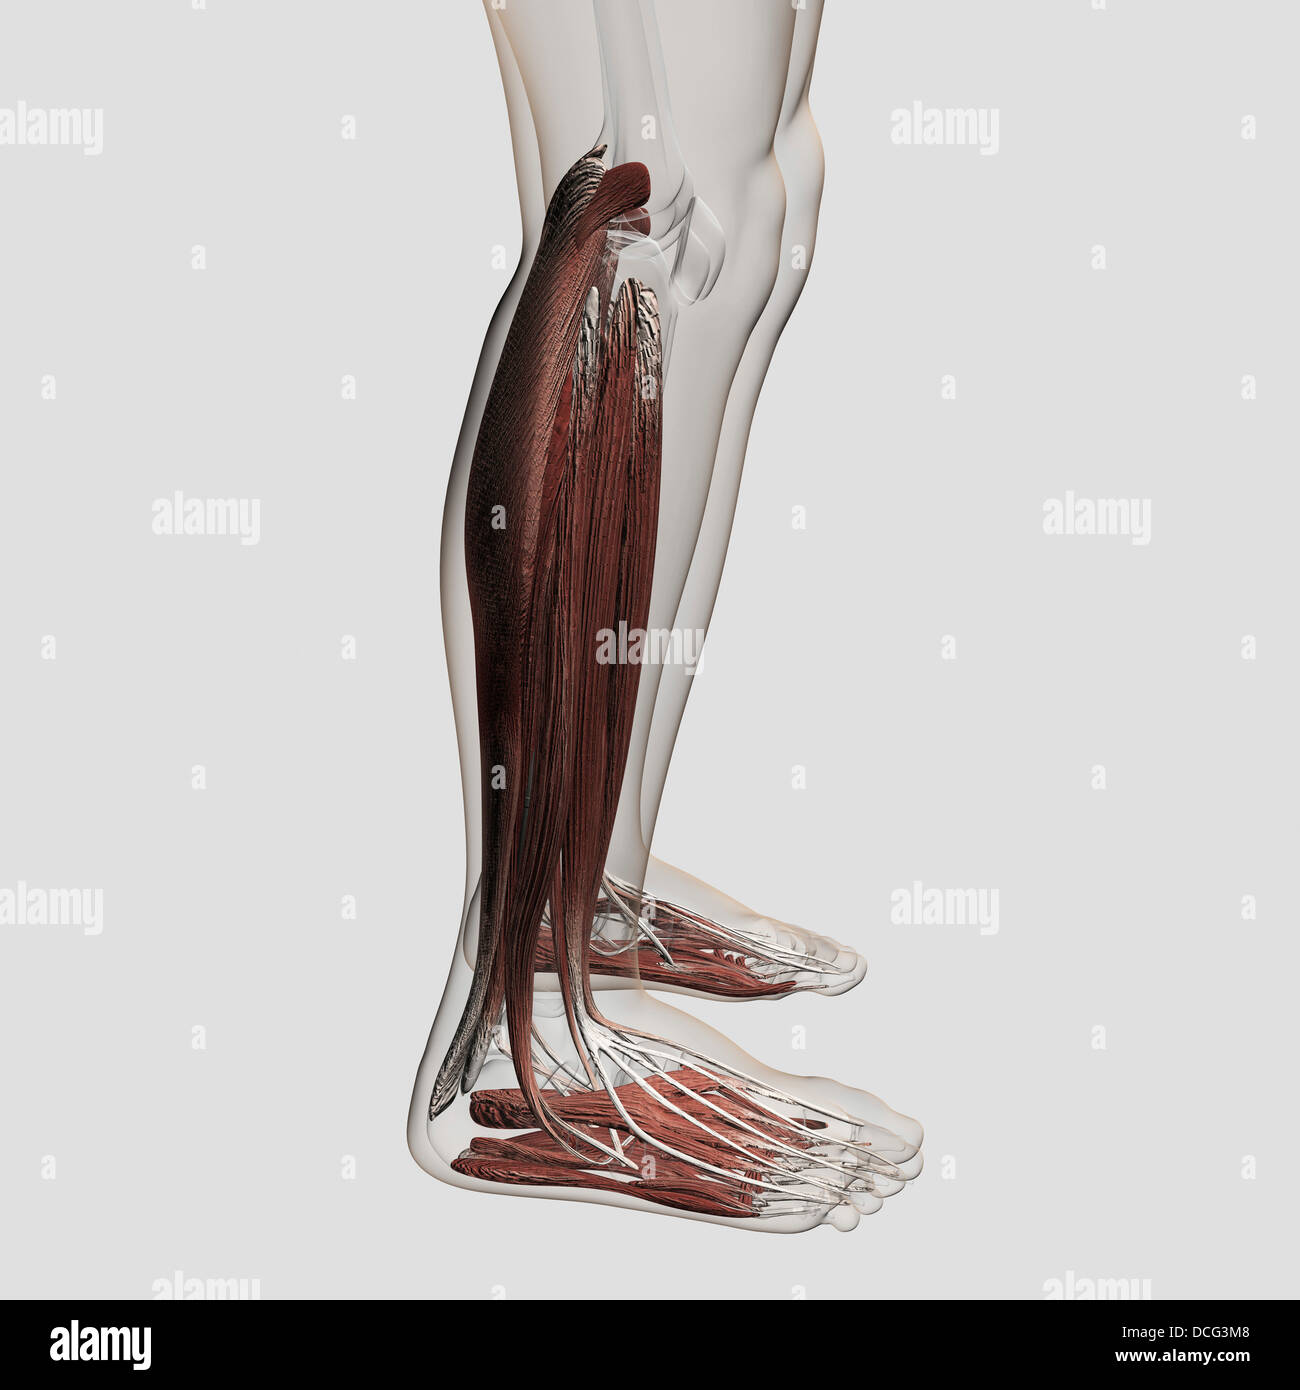 Human Muscle Imágenes De Stock & Human Muscle Fotos De Stock - Alamy